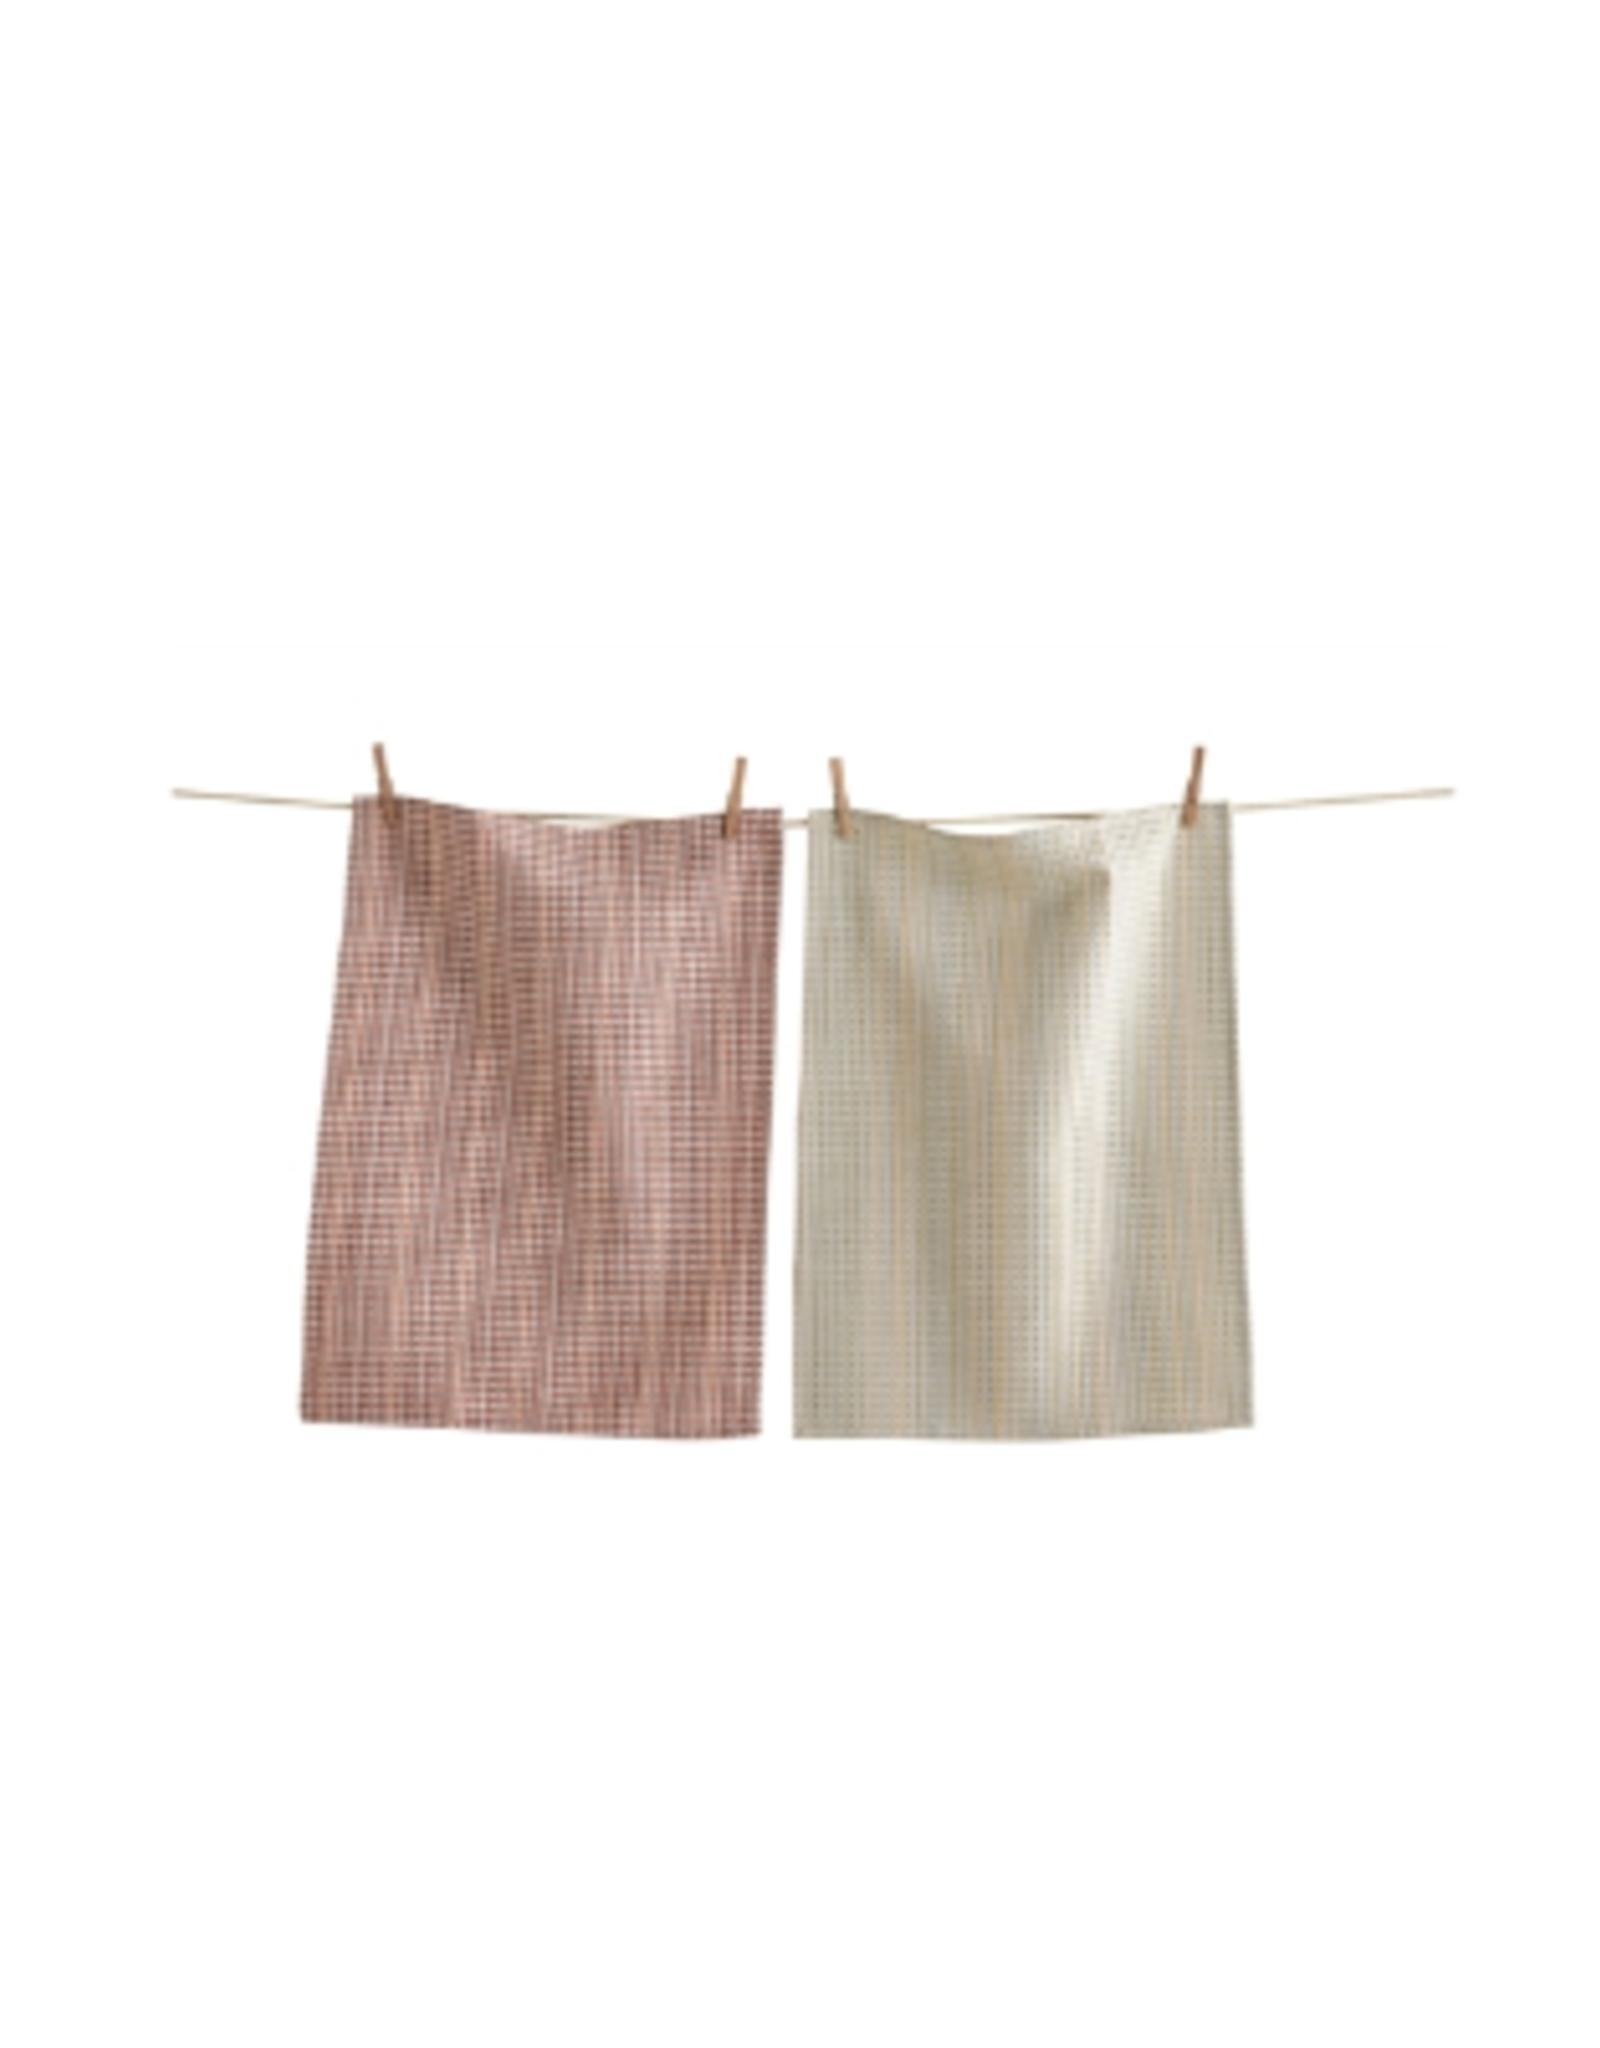 Tag Dishtowel S/2 - Chambray Stripe